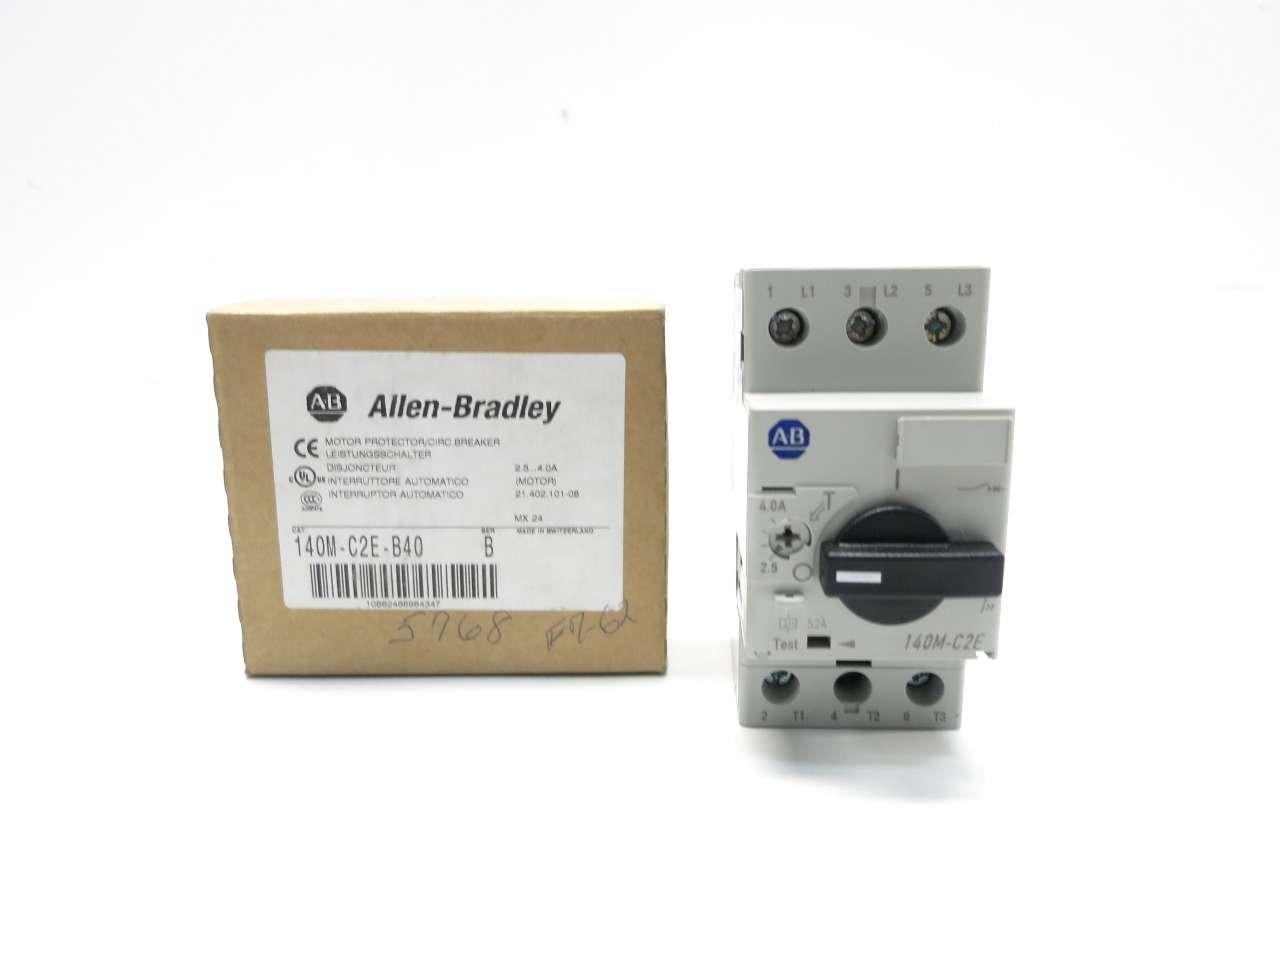 NEW ALLEN BRADLEY 140M-C2E-B40 SER B 3HP 2.5-4A AMP MANUAL MOTOR STARTER D512285 by Allen-Bradley (Image #9)